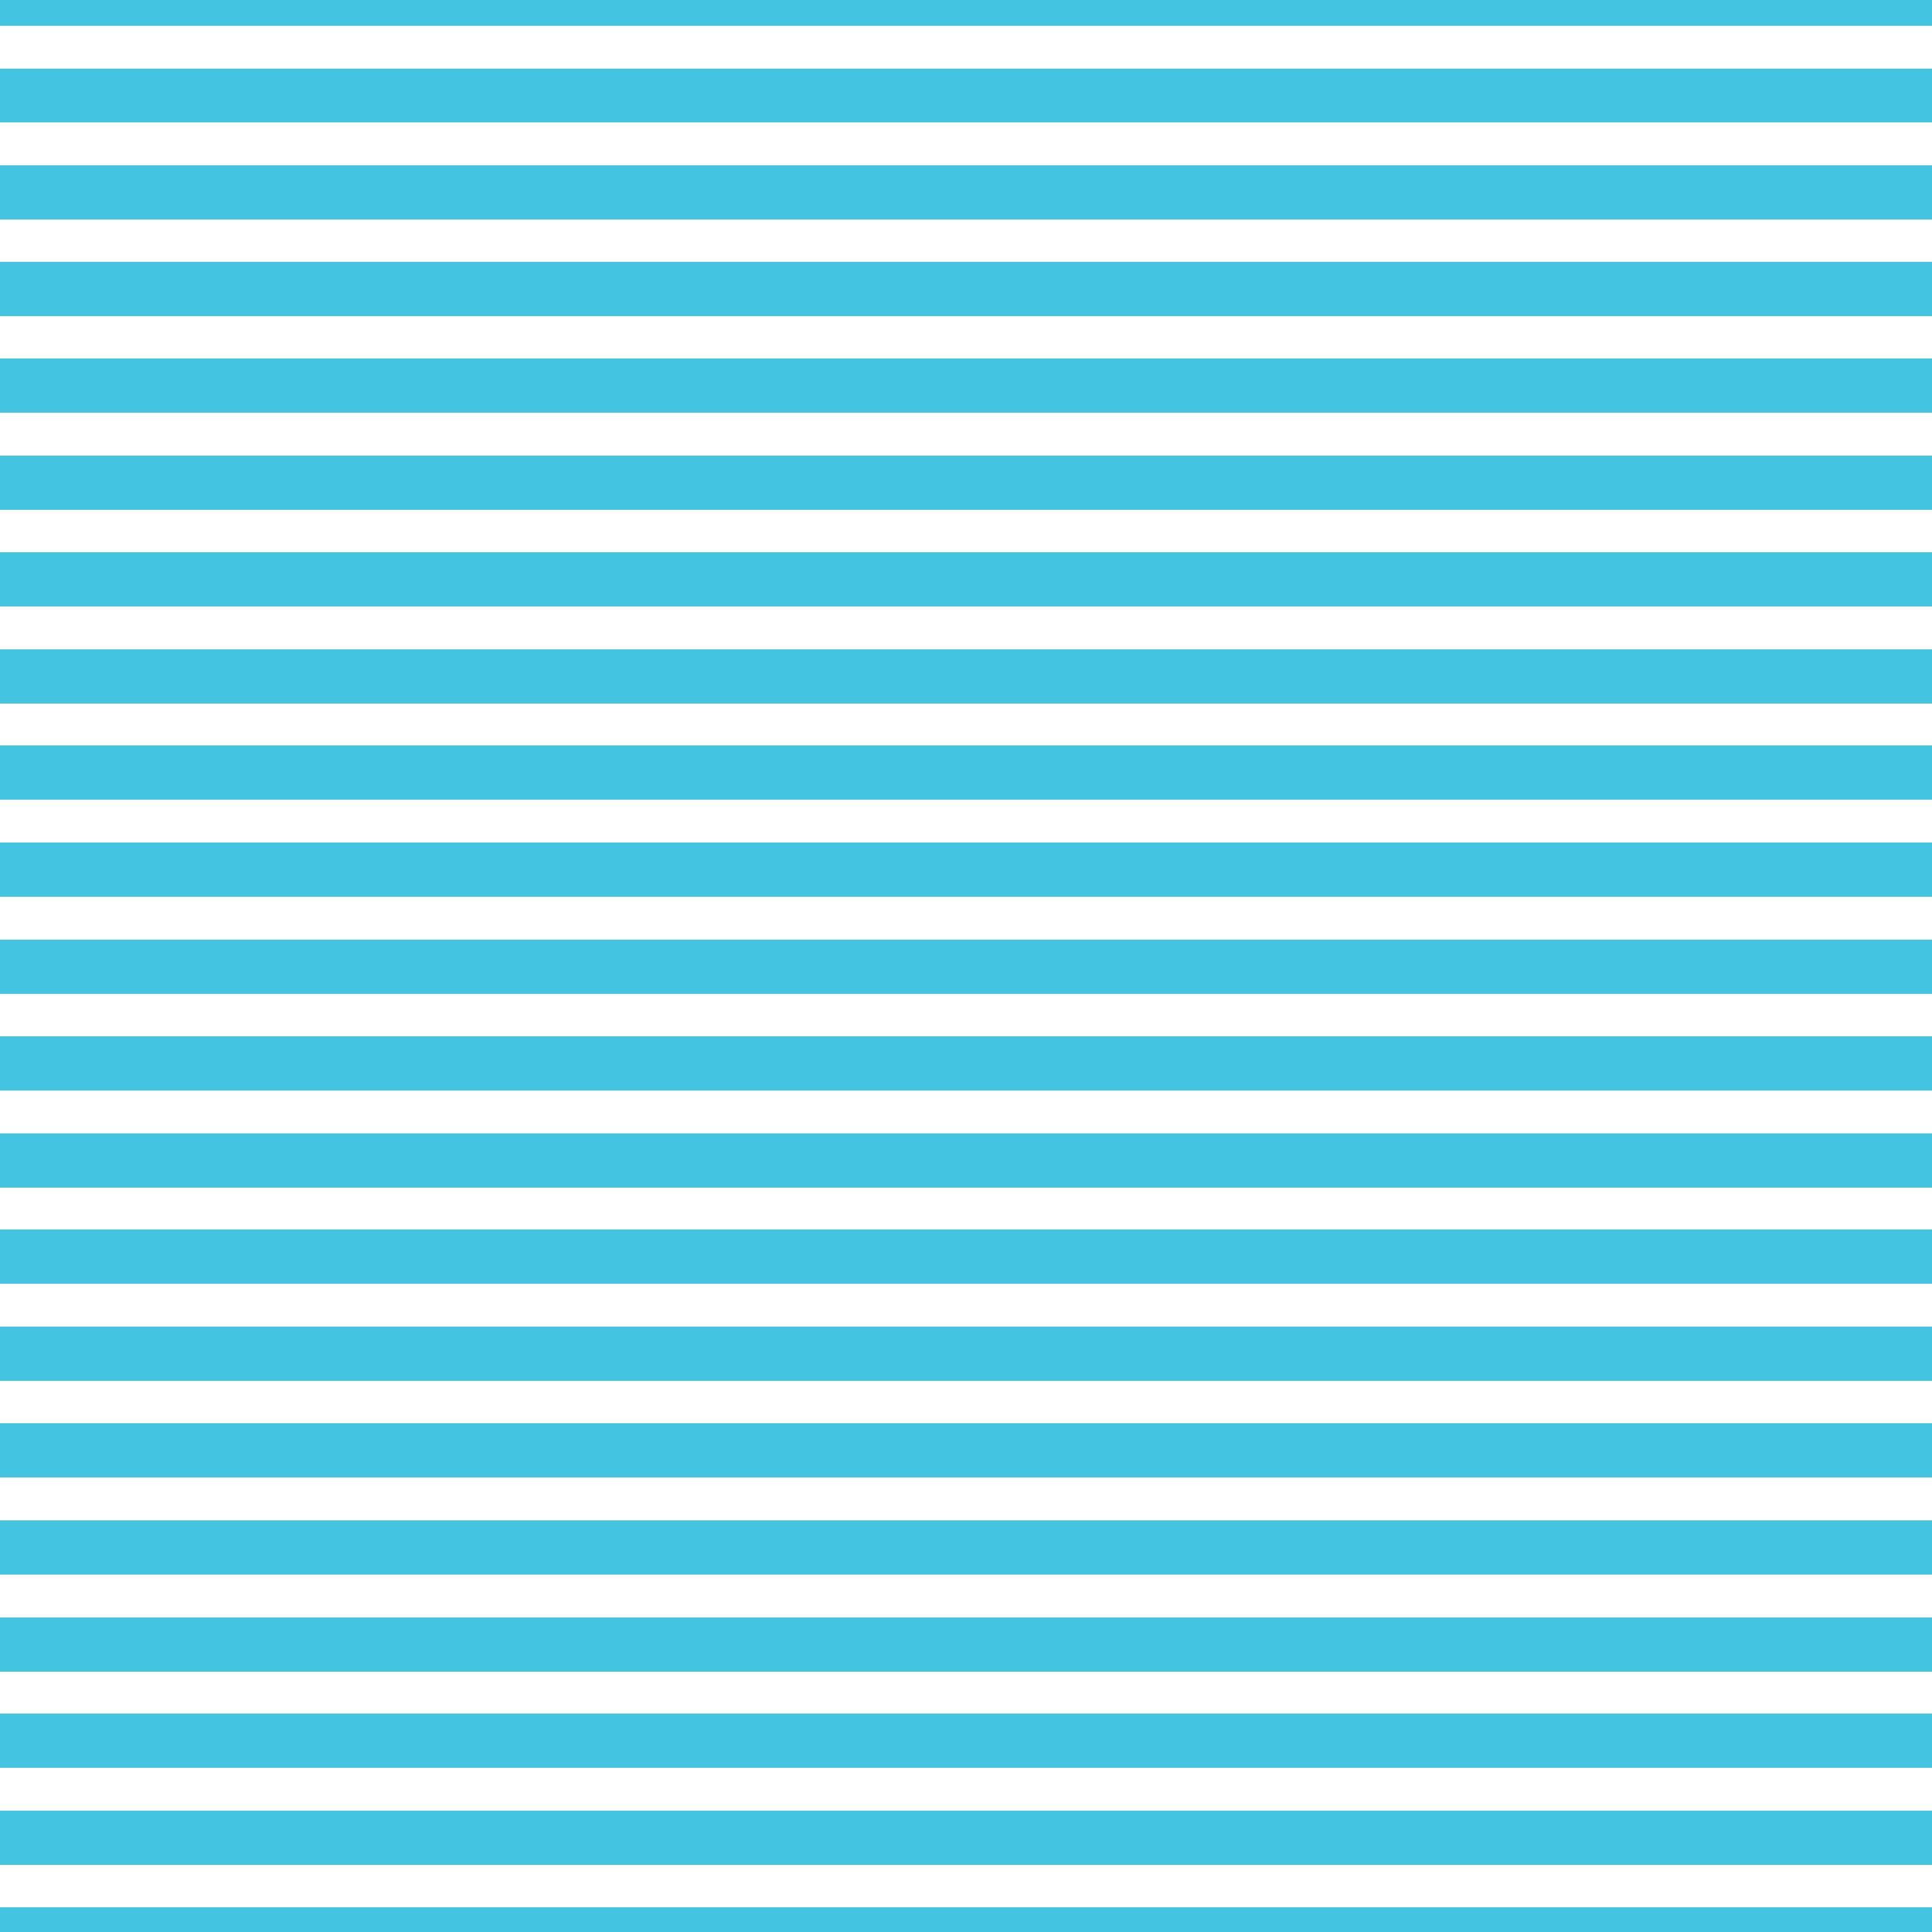 blue horizontal striped background wwwpixsharkcom